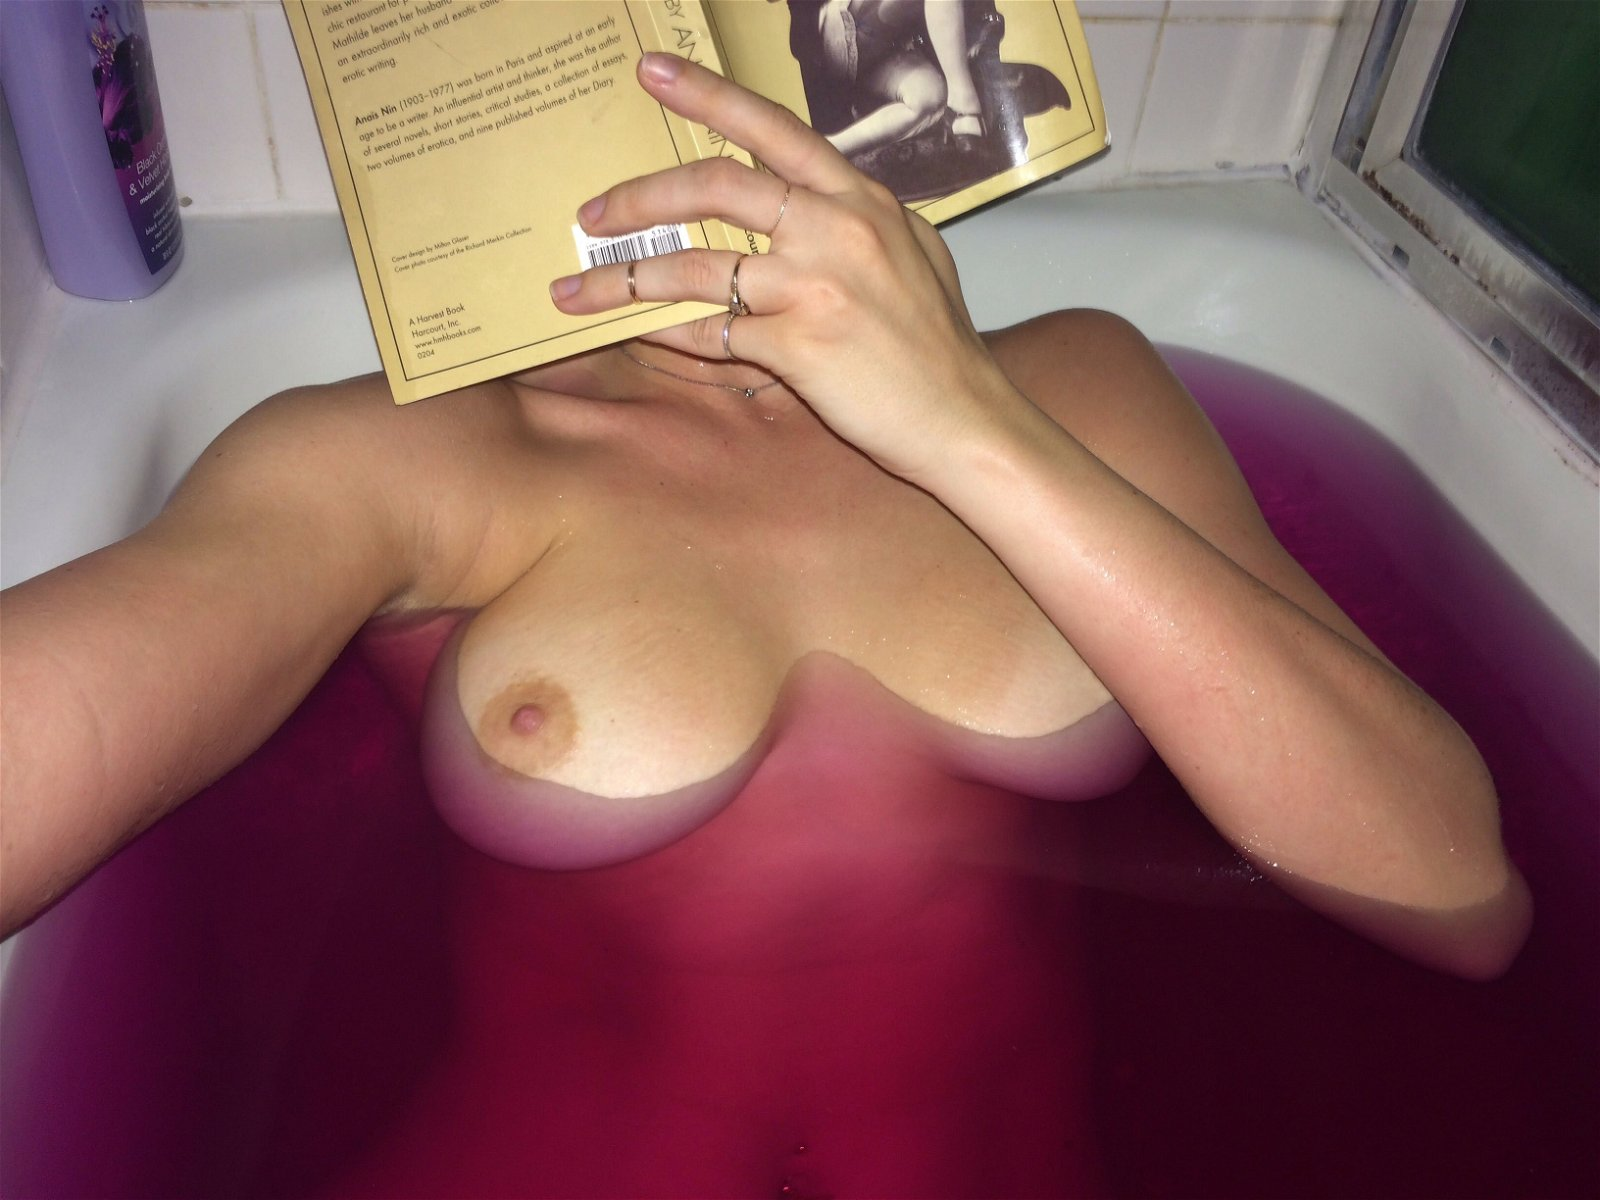 Aly Michalka nice tits